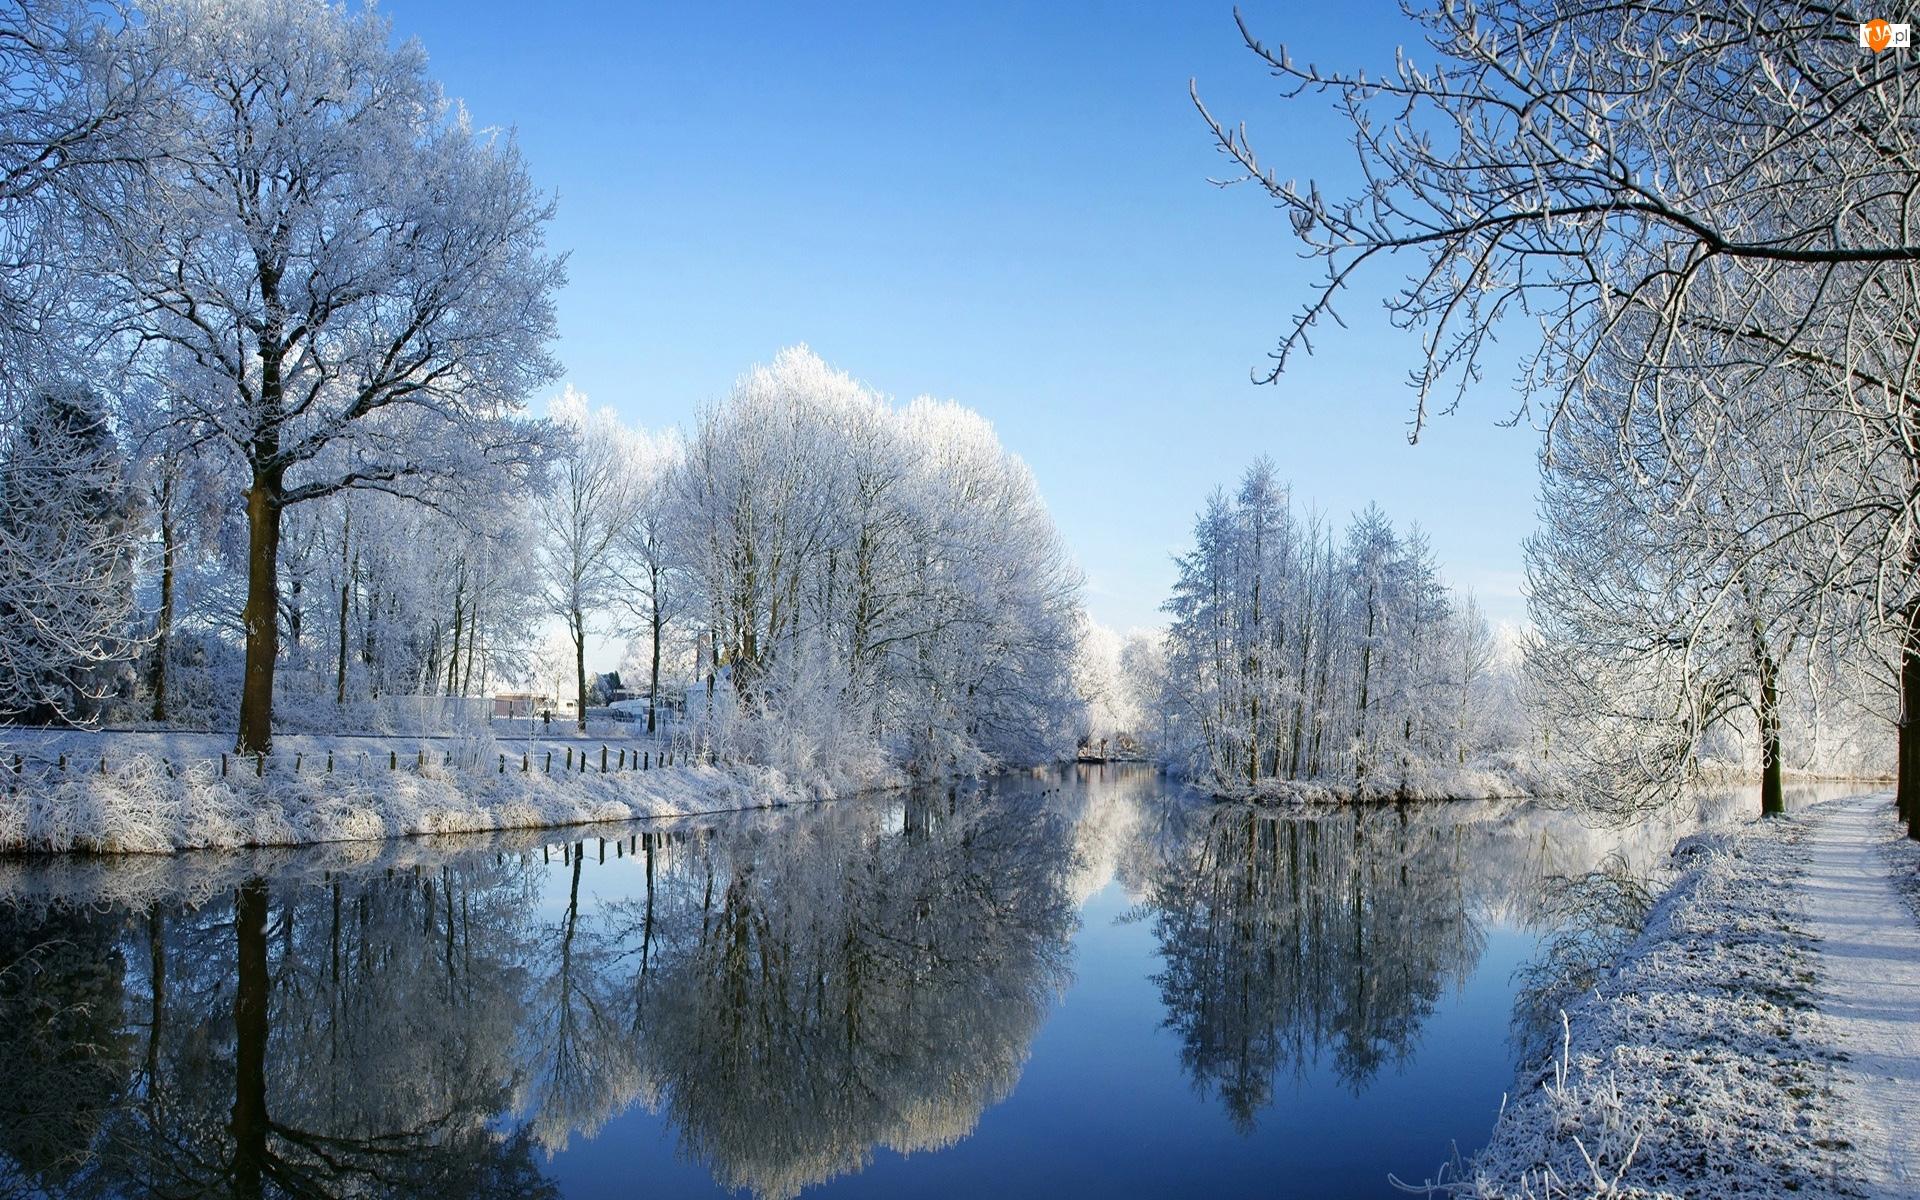 Zima, Rzeka, Drzewa, Szron